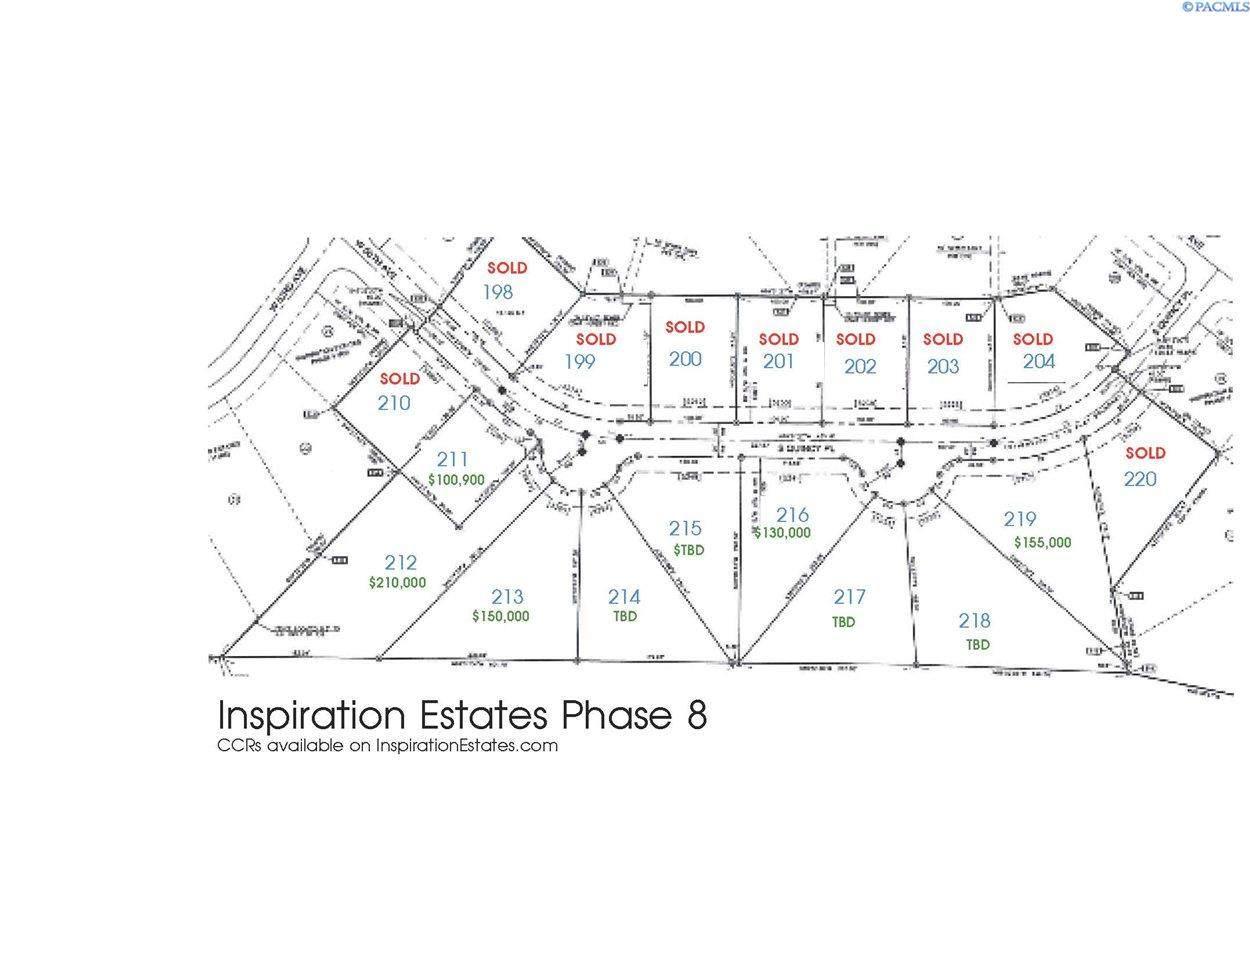 IE LOT 219 Phase Viii - Photo 1